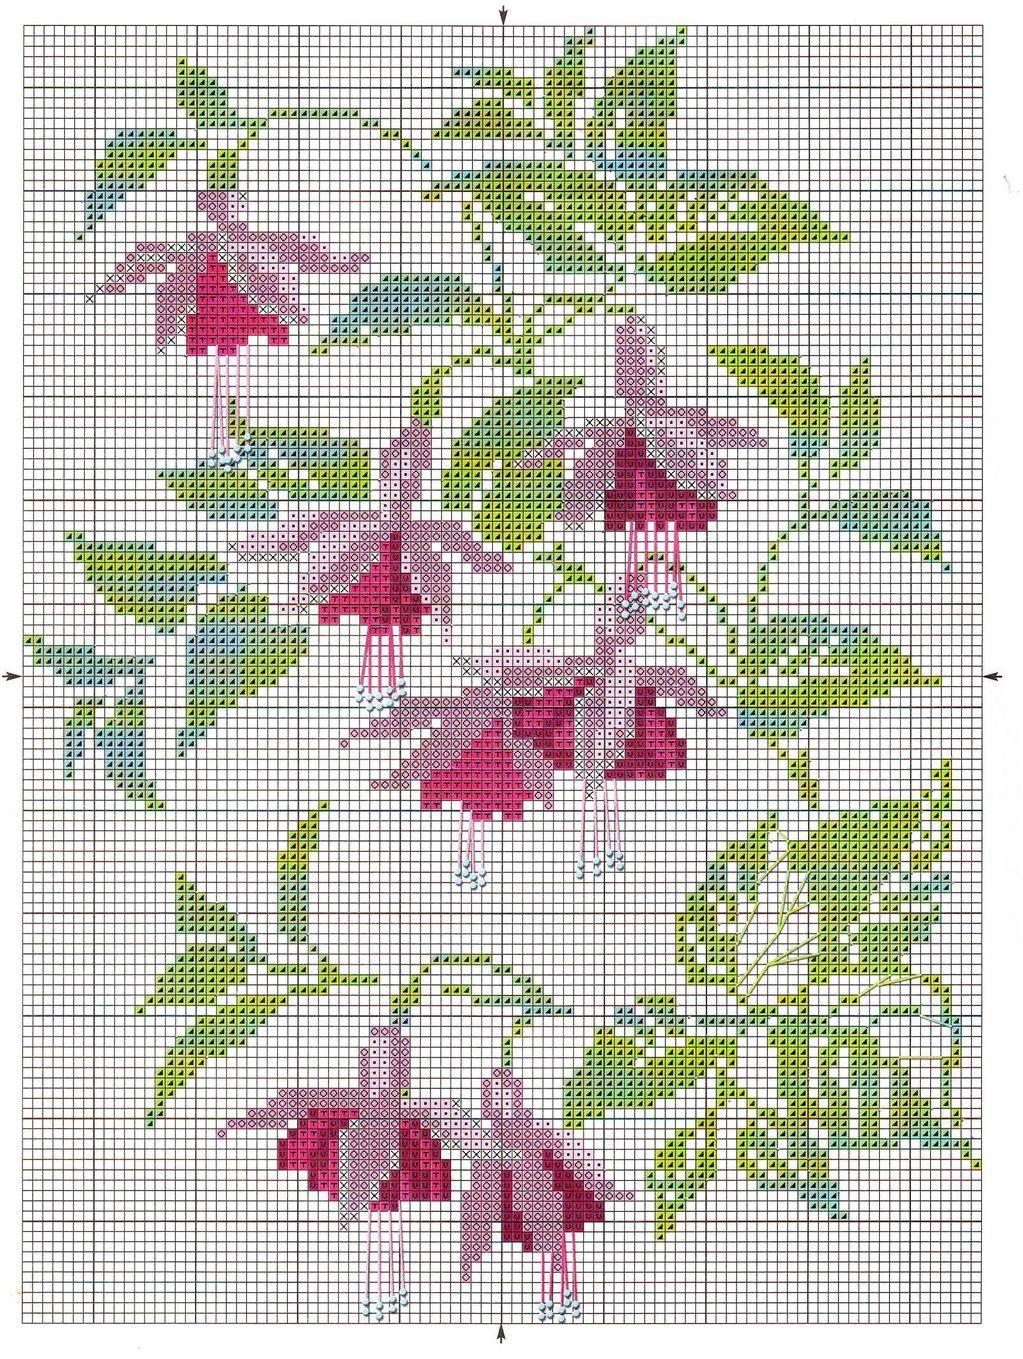 Pin by vasso k on cross stitch flora pinterest stitches flower